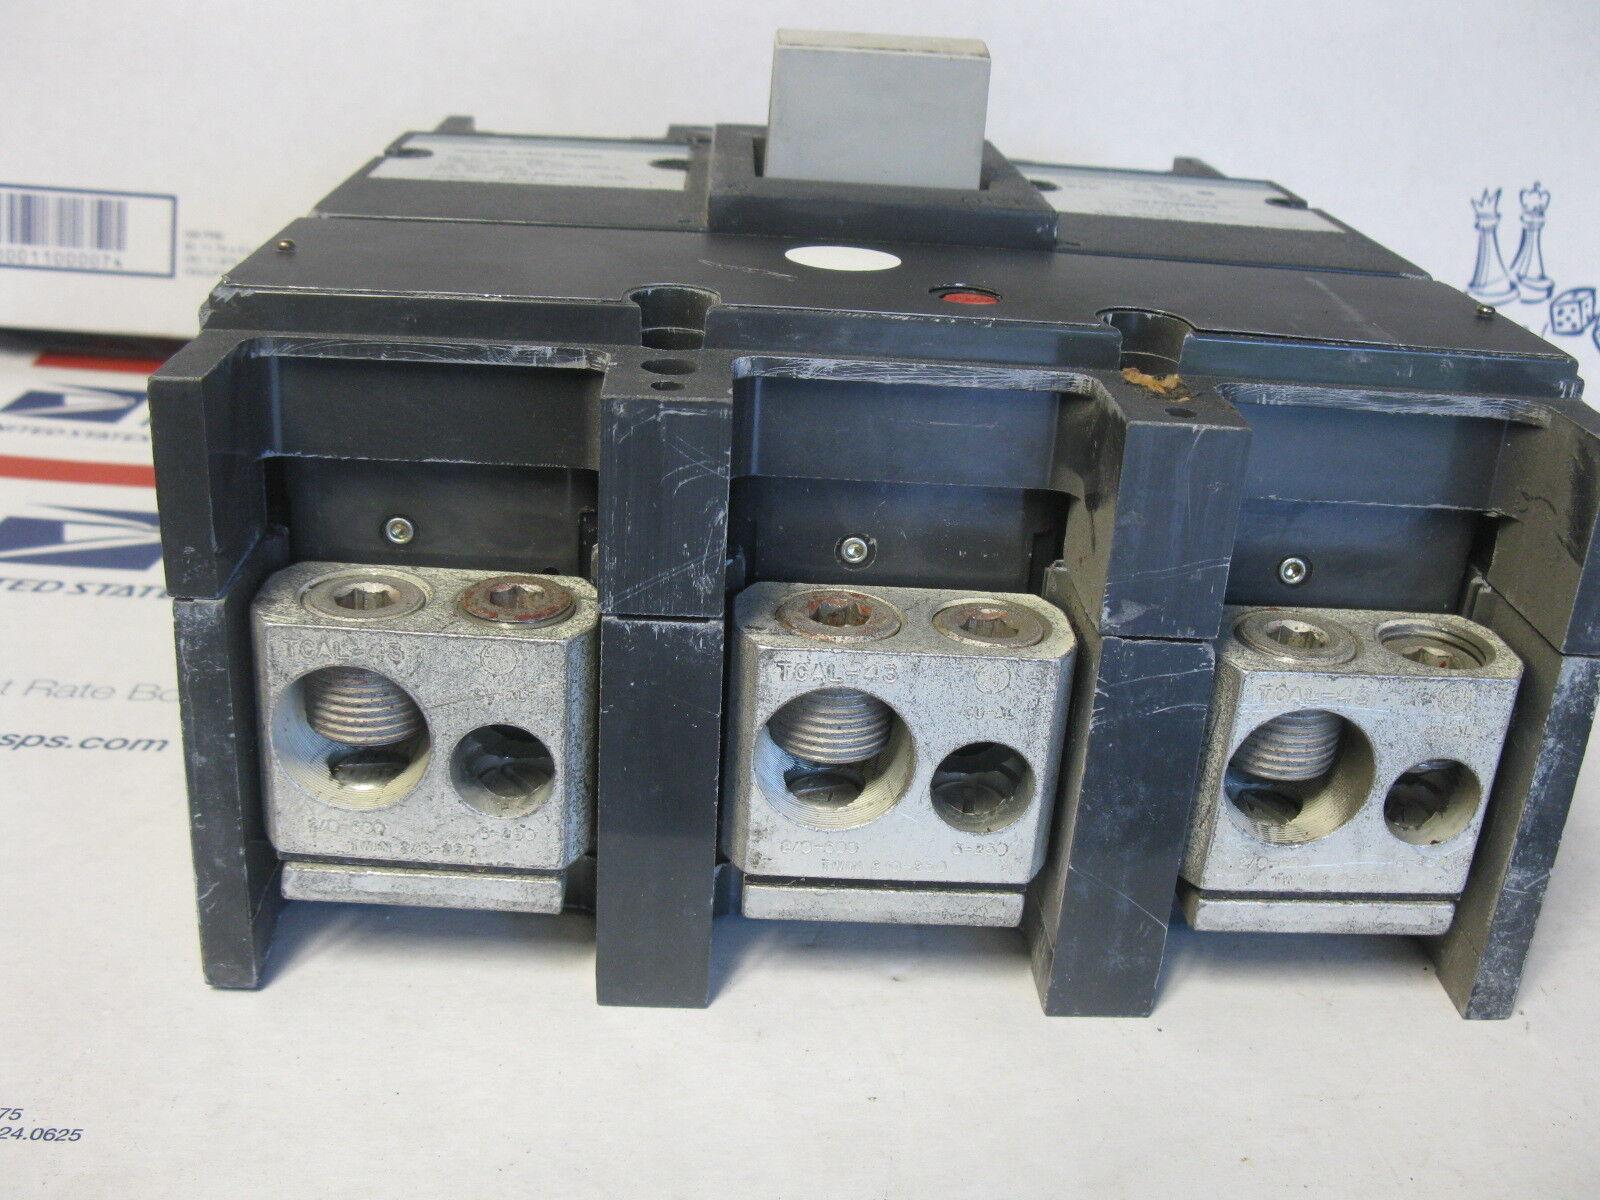 3 Pole Circuit Breaker- WARRANTY 300 Amp GE TJD432300 240 Volt Black